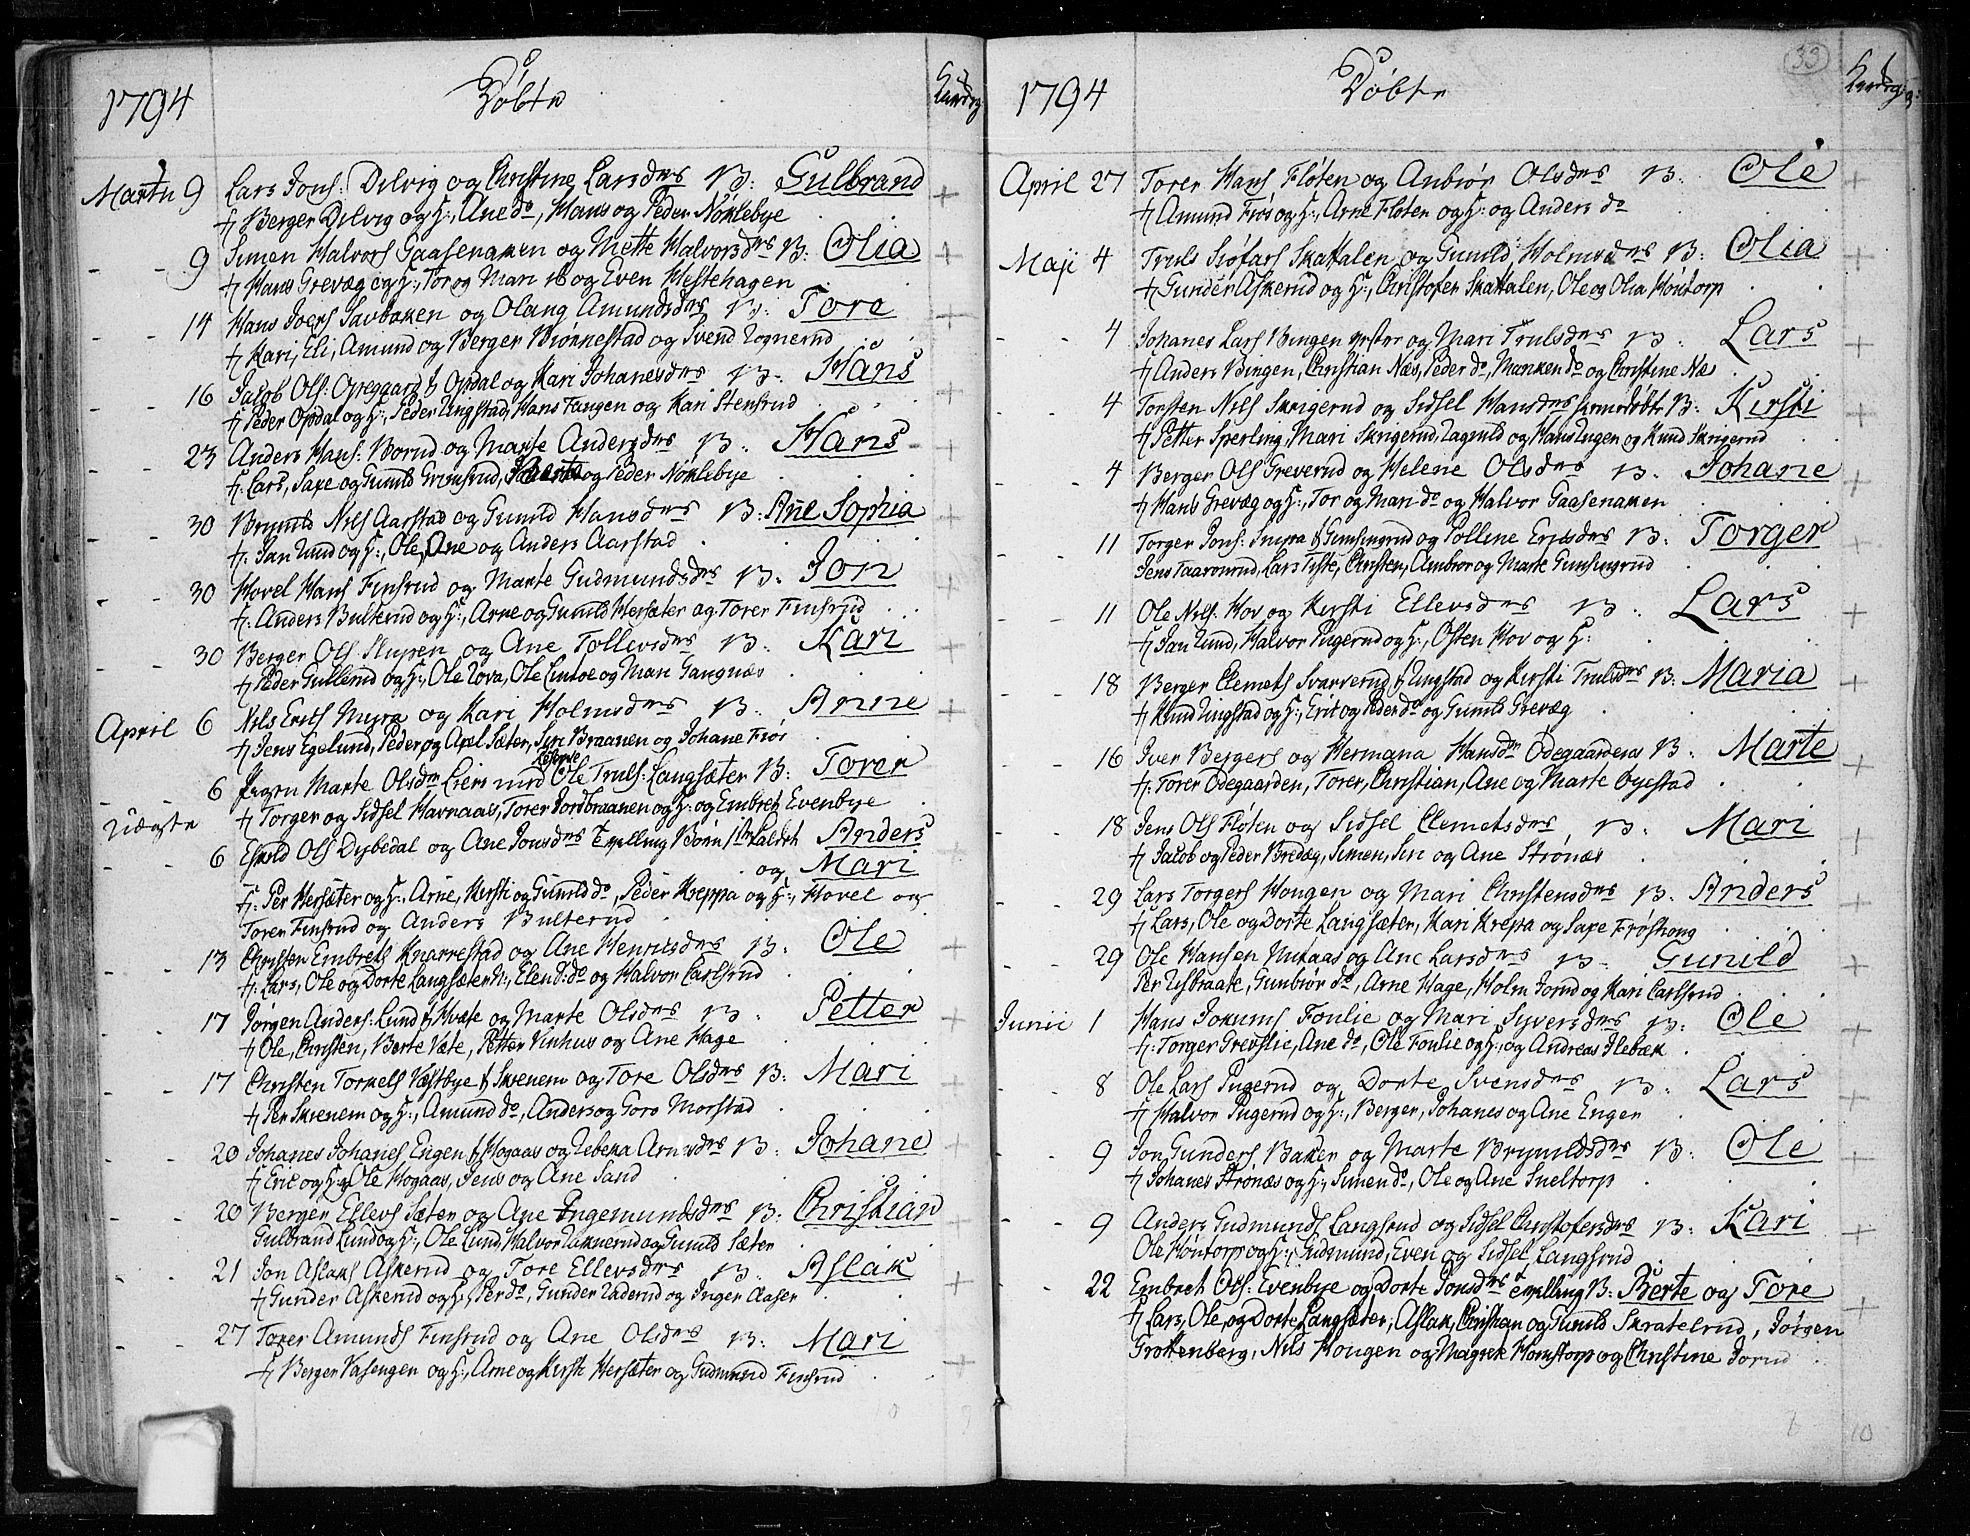 SAO, Trøgstad prestekontor Kirkebøker, F/Fa/L0005: Ministerialbok nr. I 5, 1784-1814, s. 33